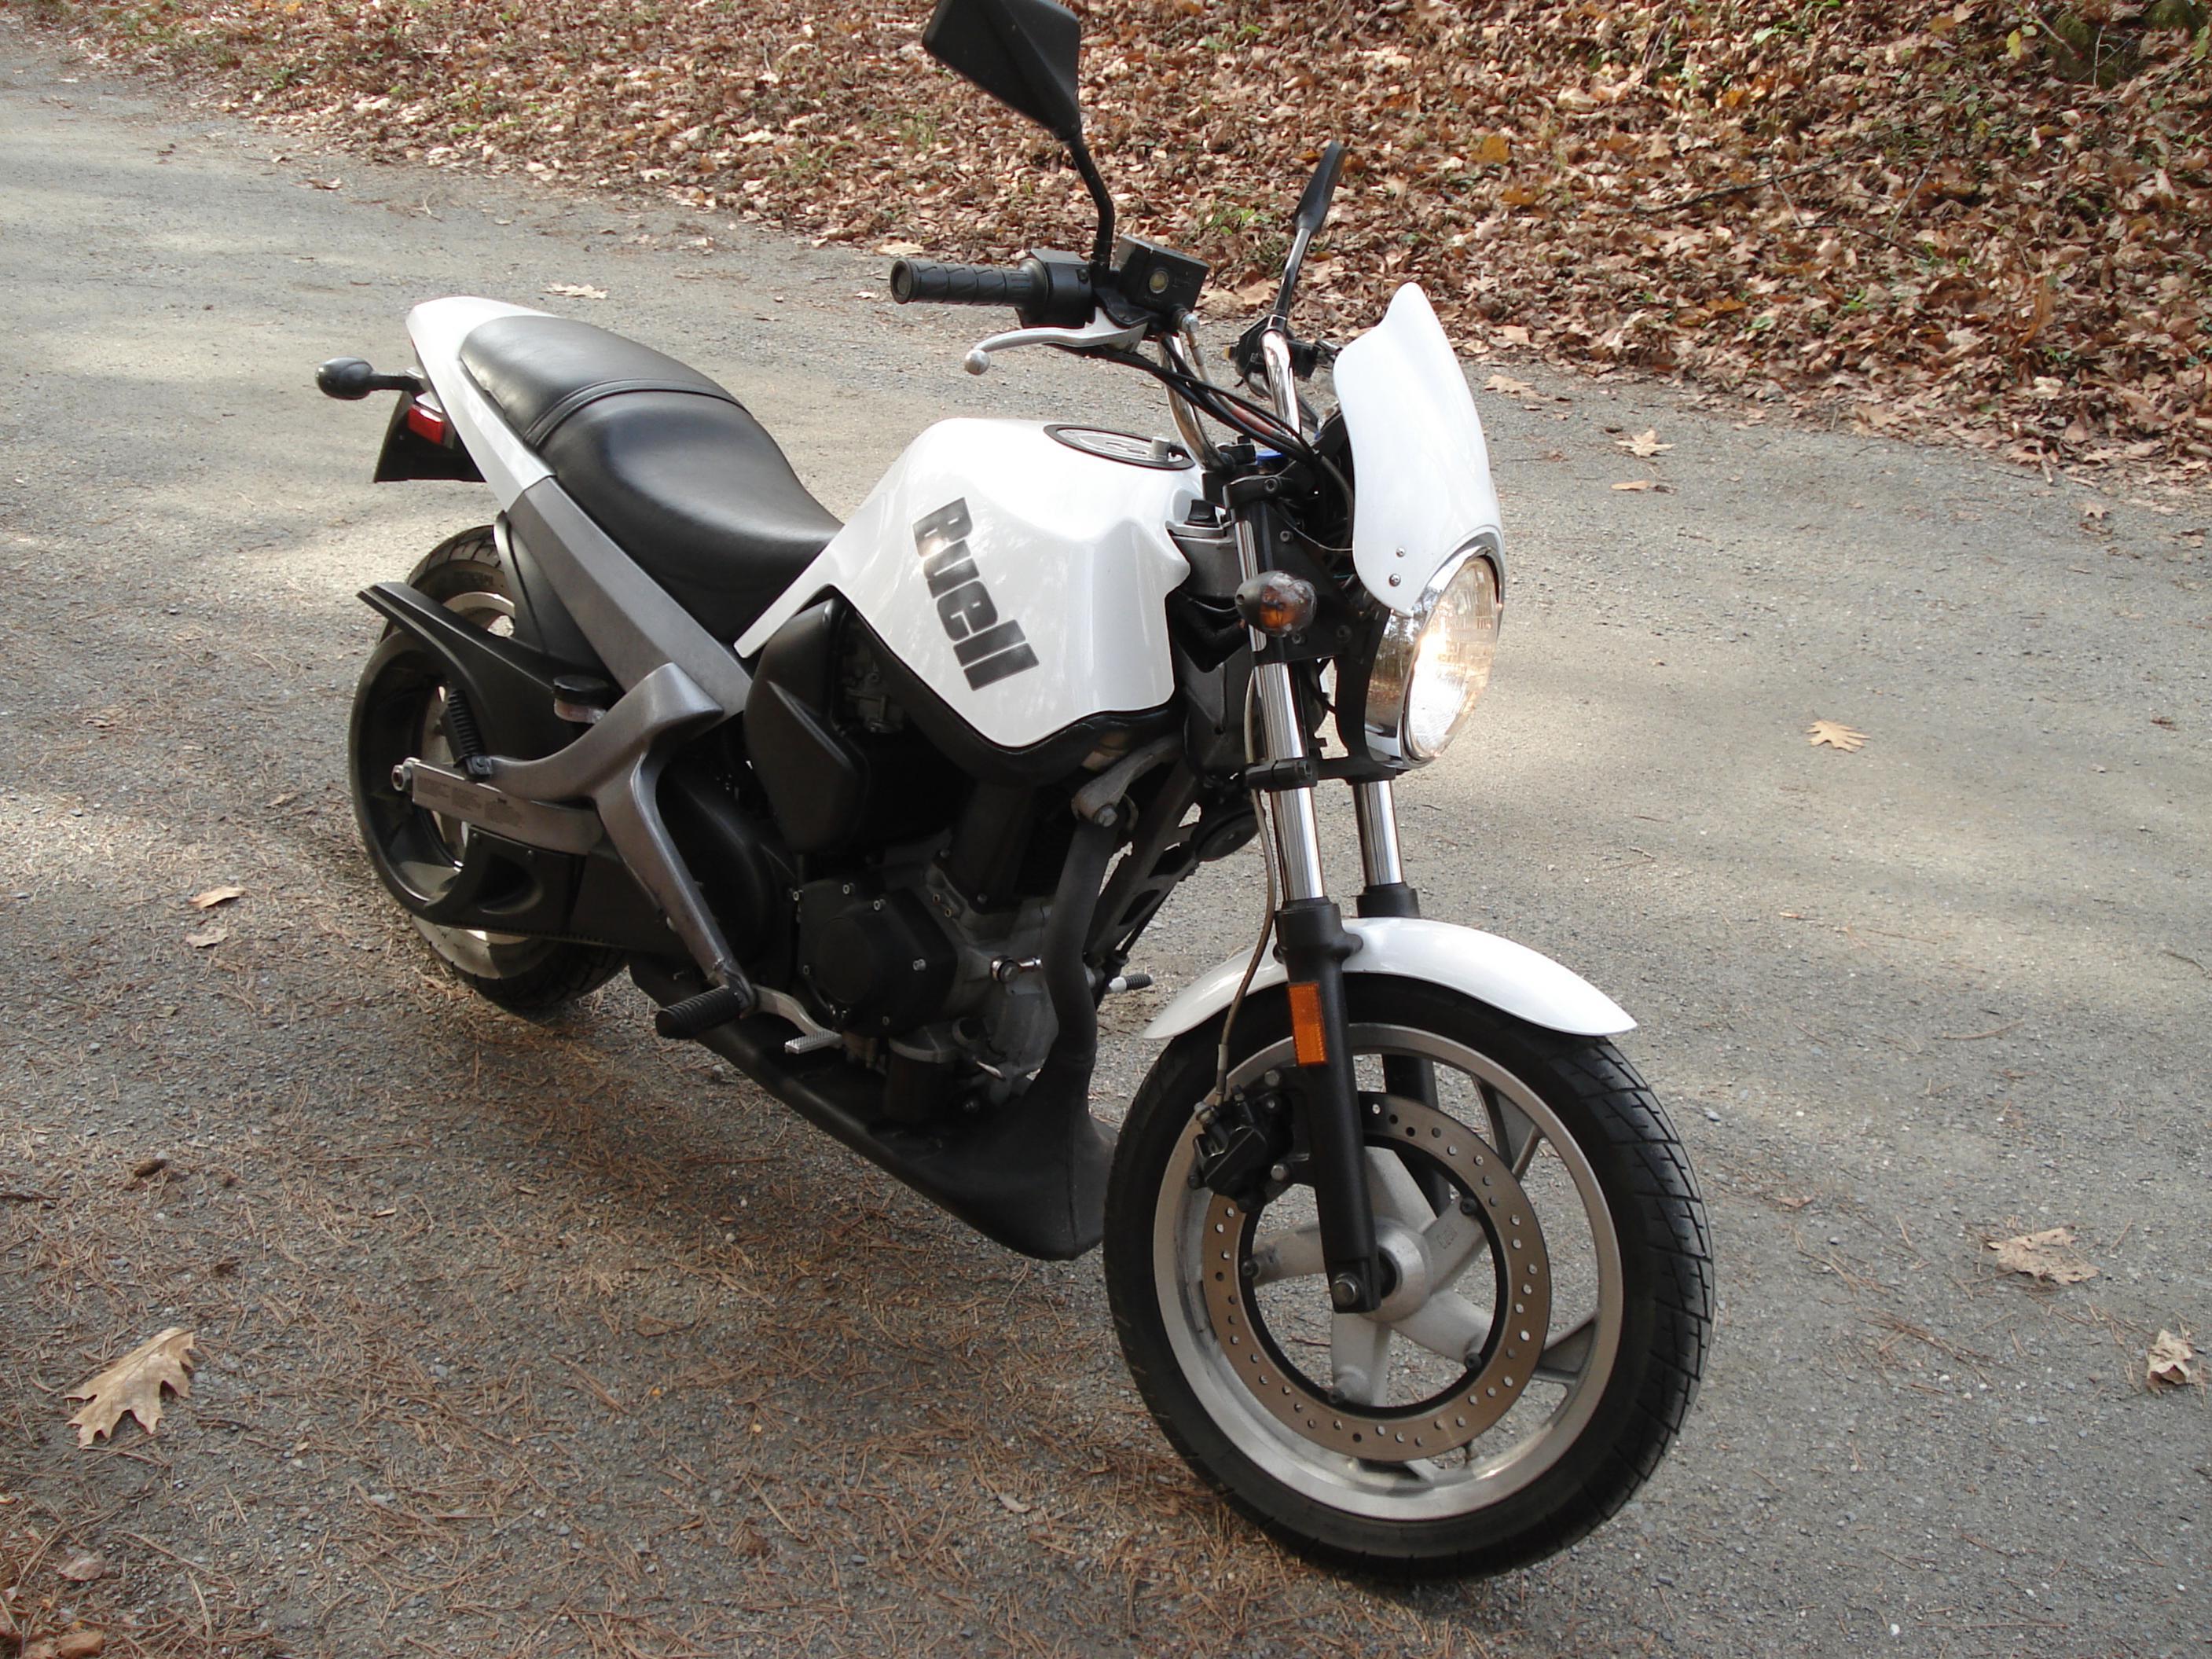 Fs Girlfriend Bike 2000 Buell Blast Ducati Ms The